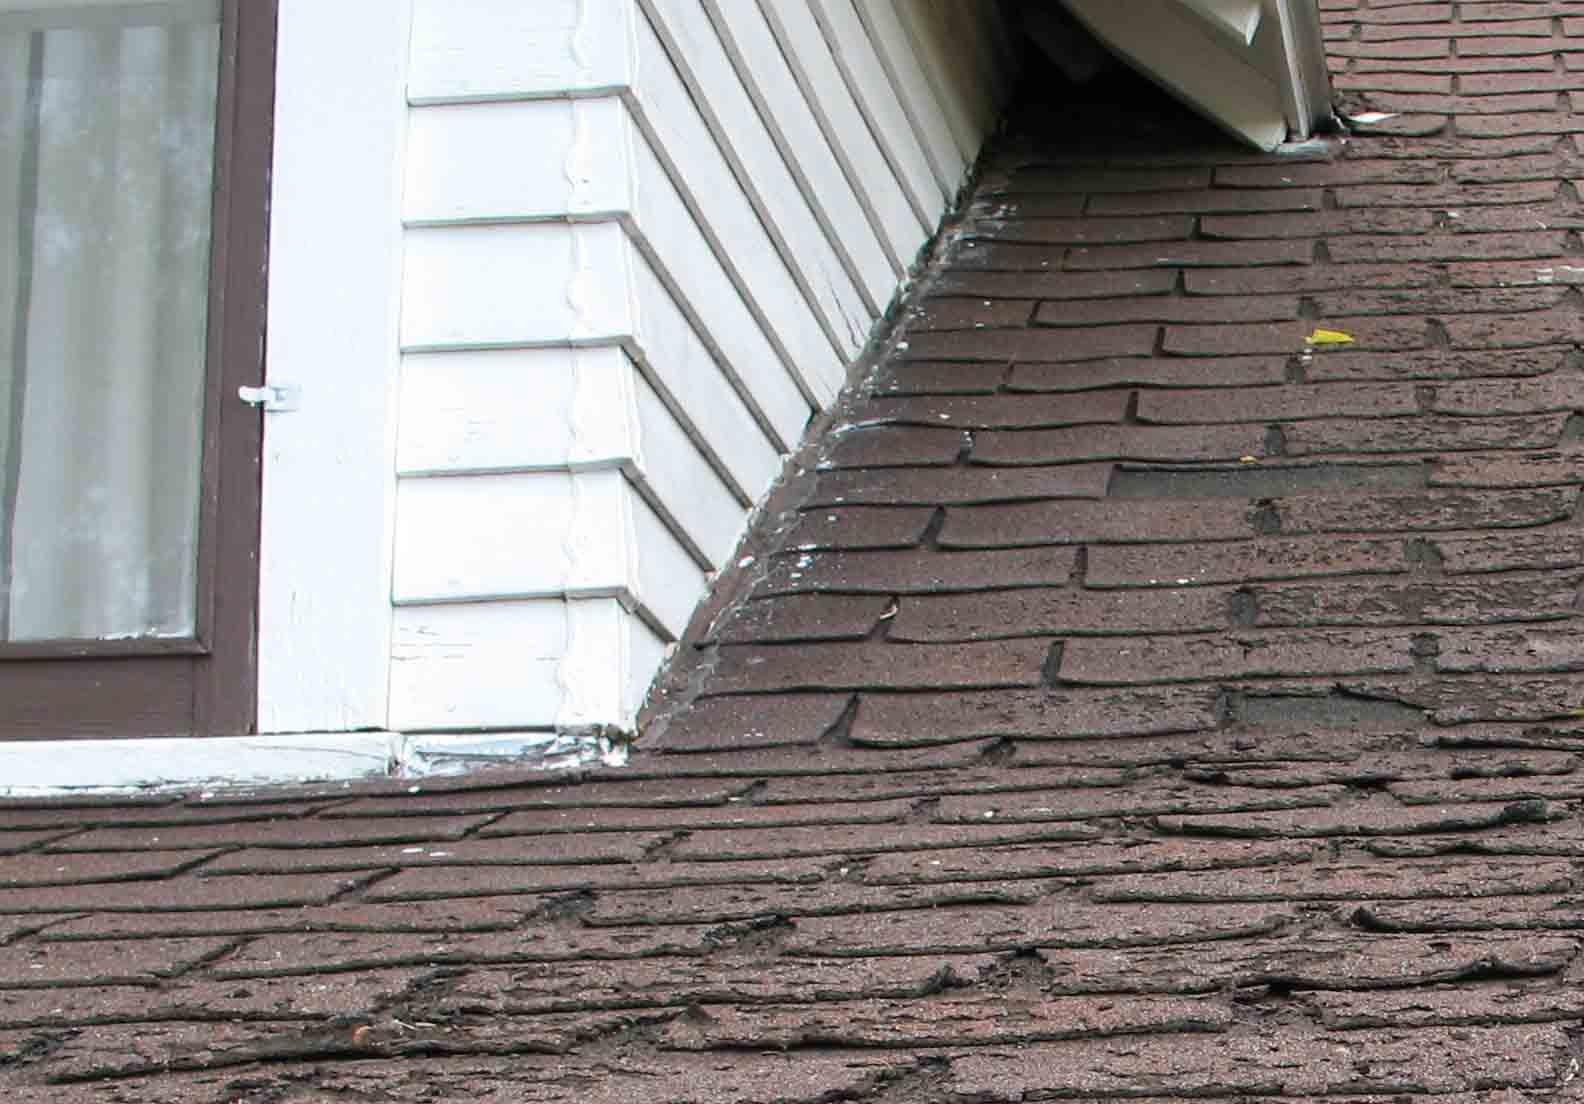 Asbestos Shingles Siding Ll Removal Repair Replacement